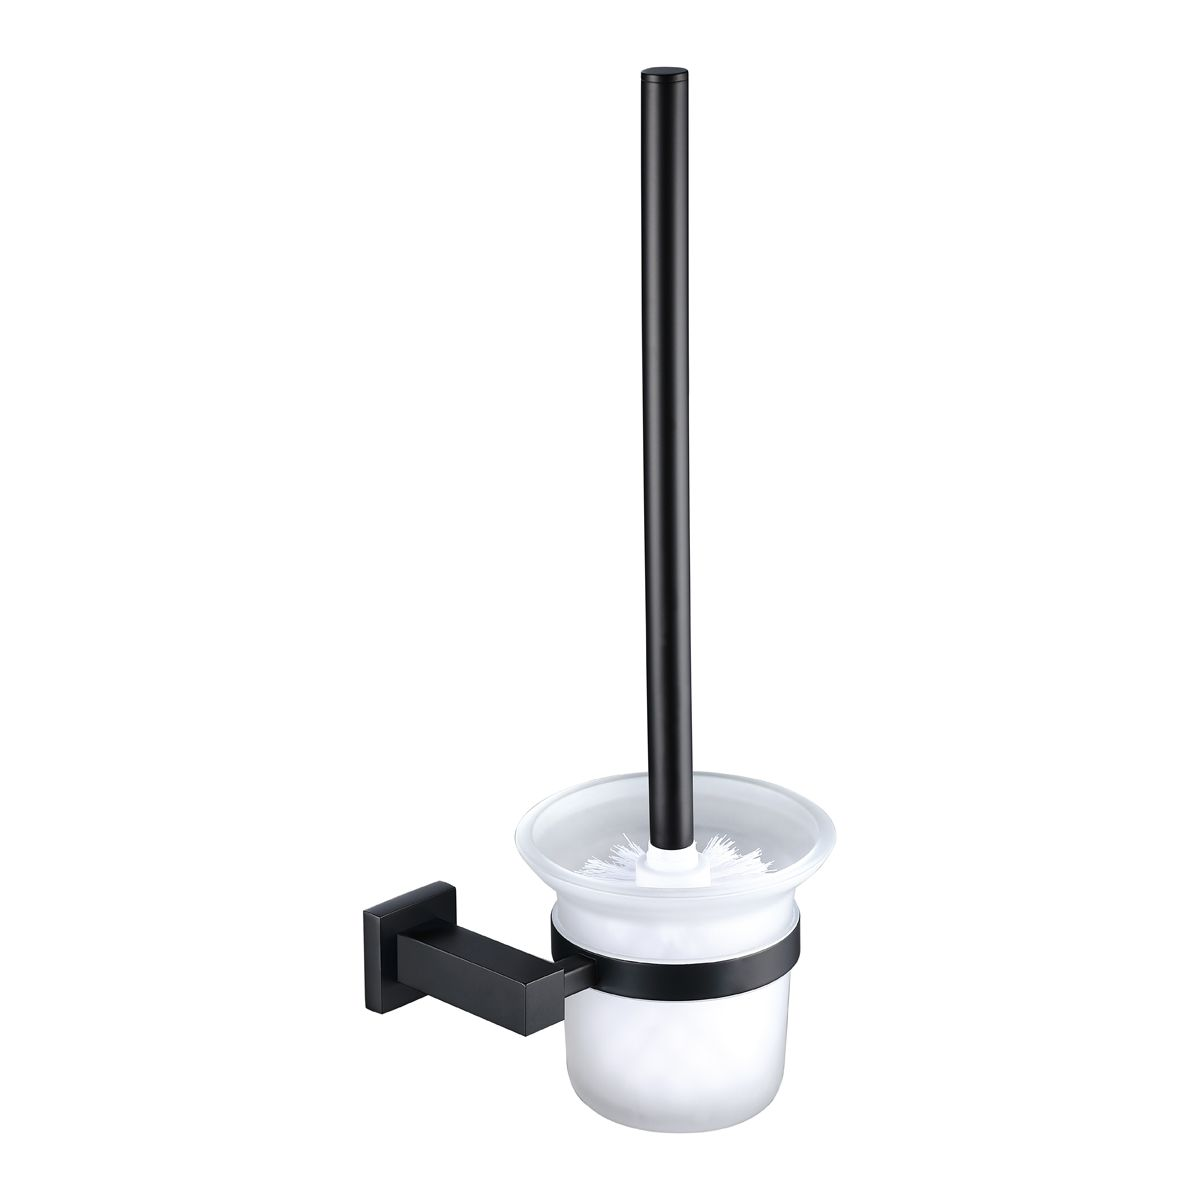 RAK Cubis Black Toilet Brush with Holder